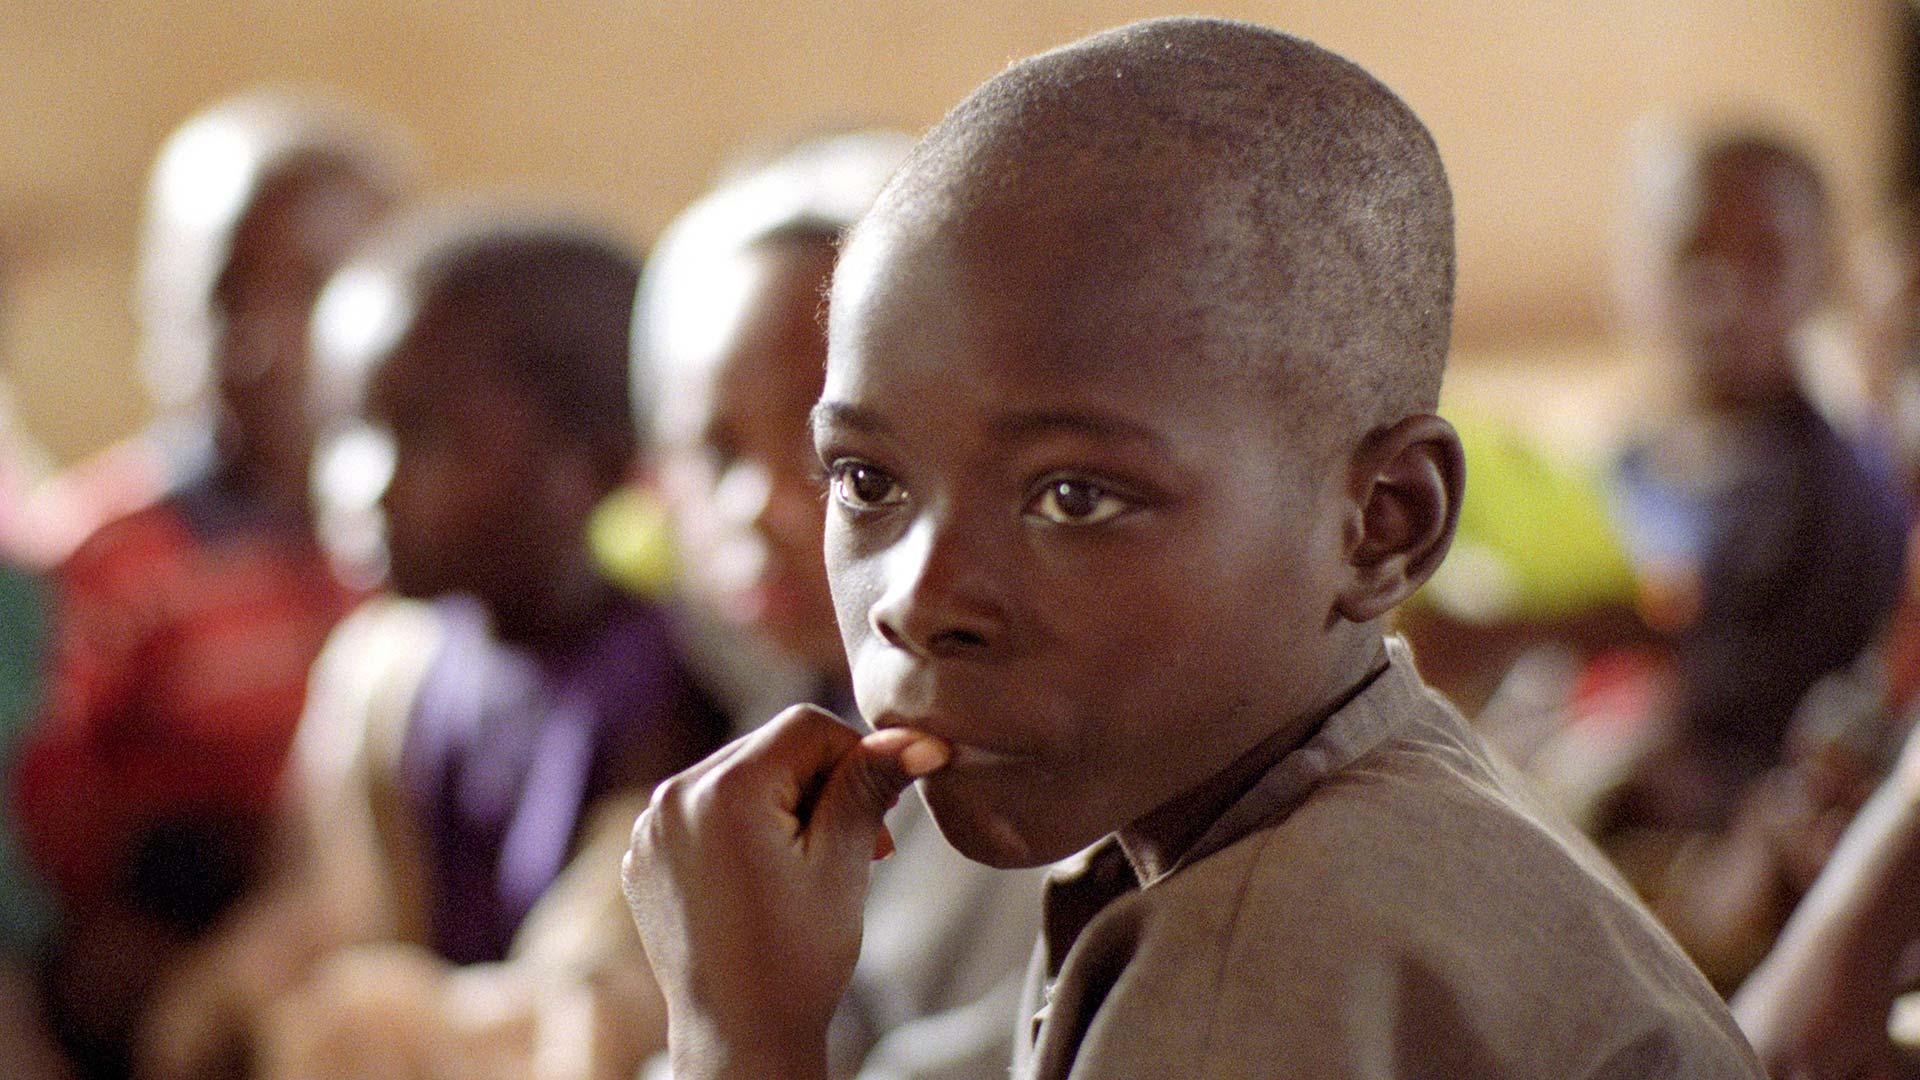 Focused Malawian child in classroom